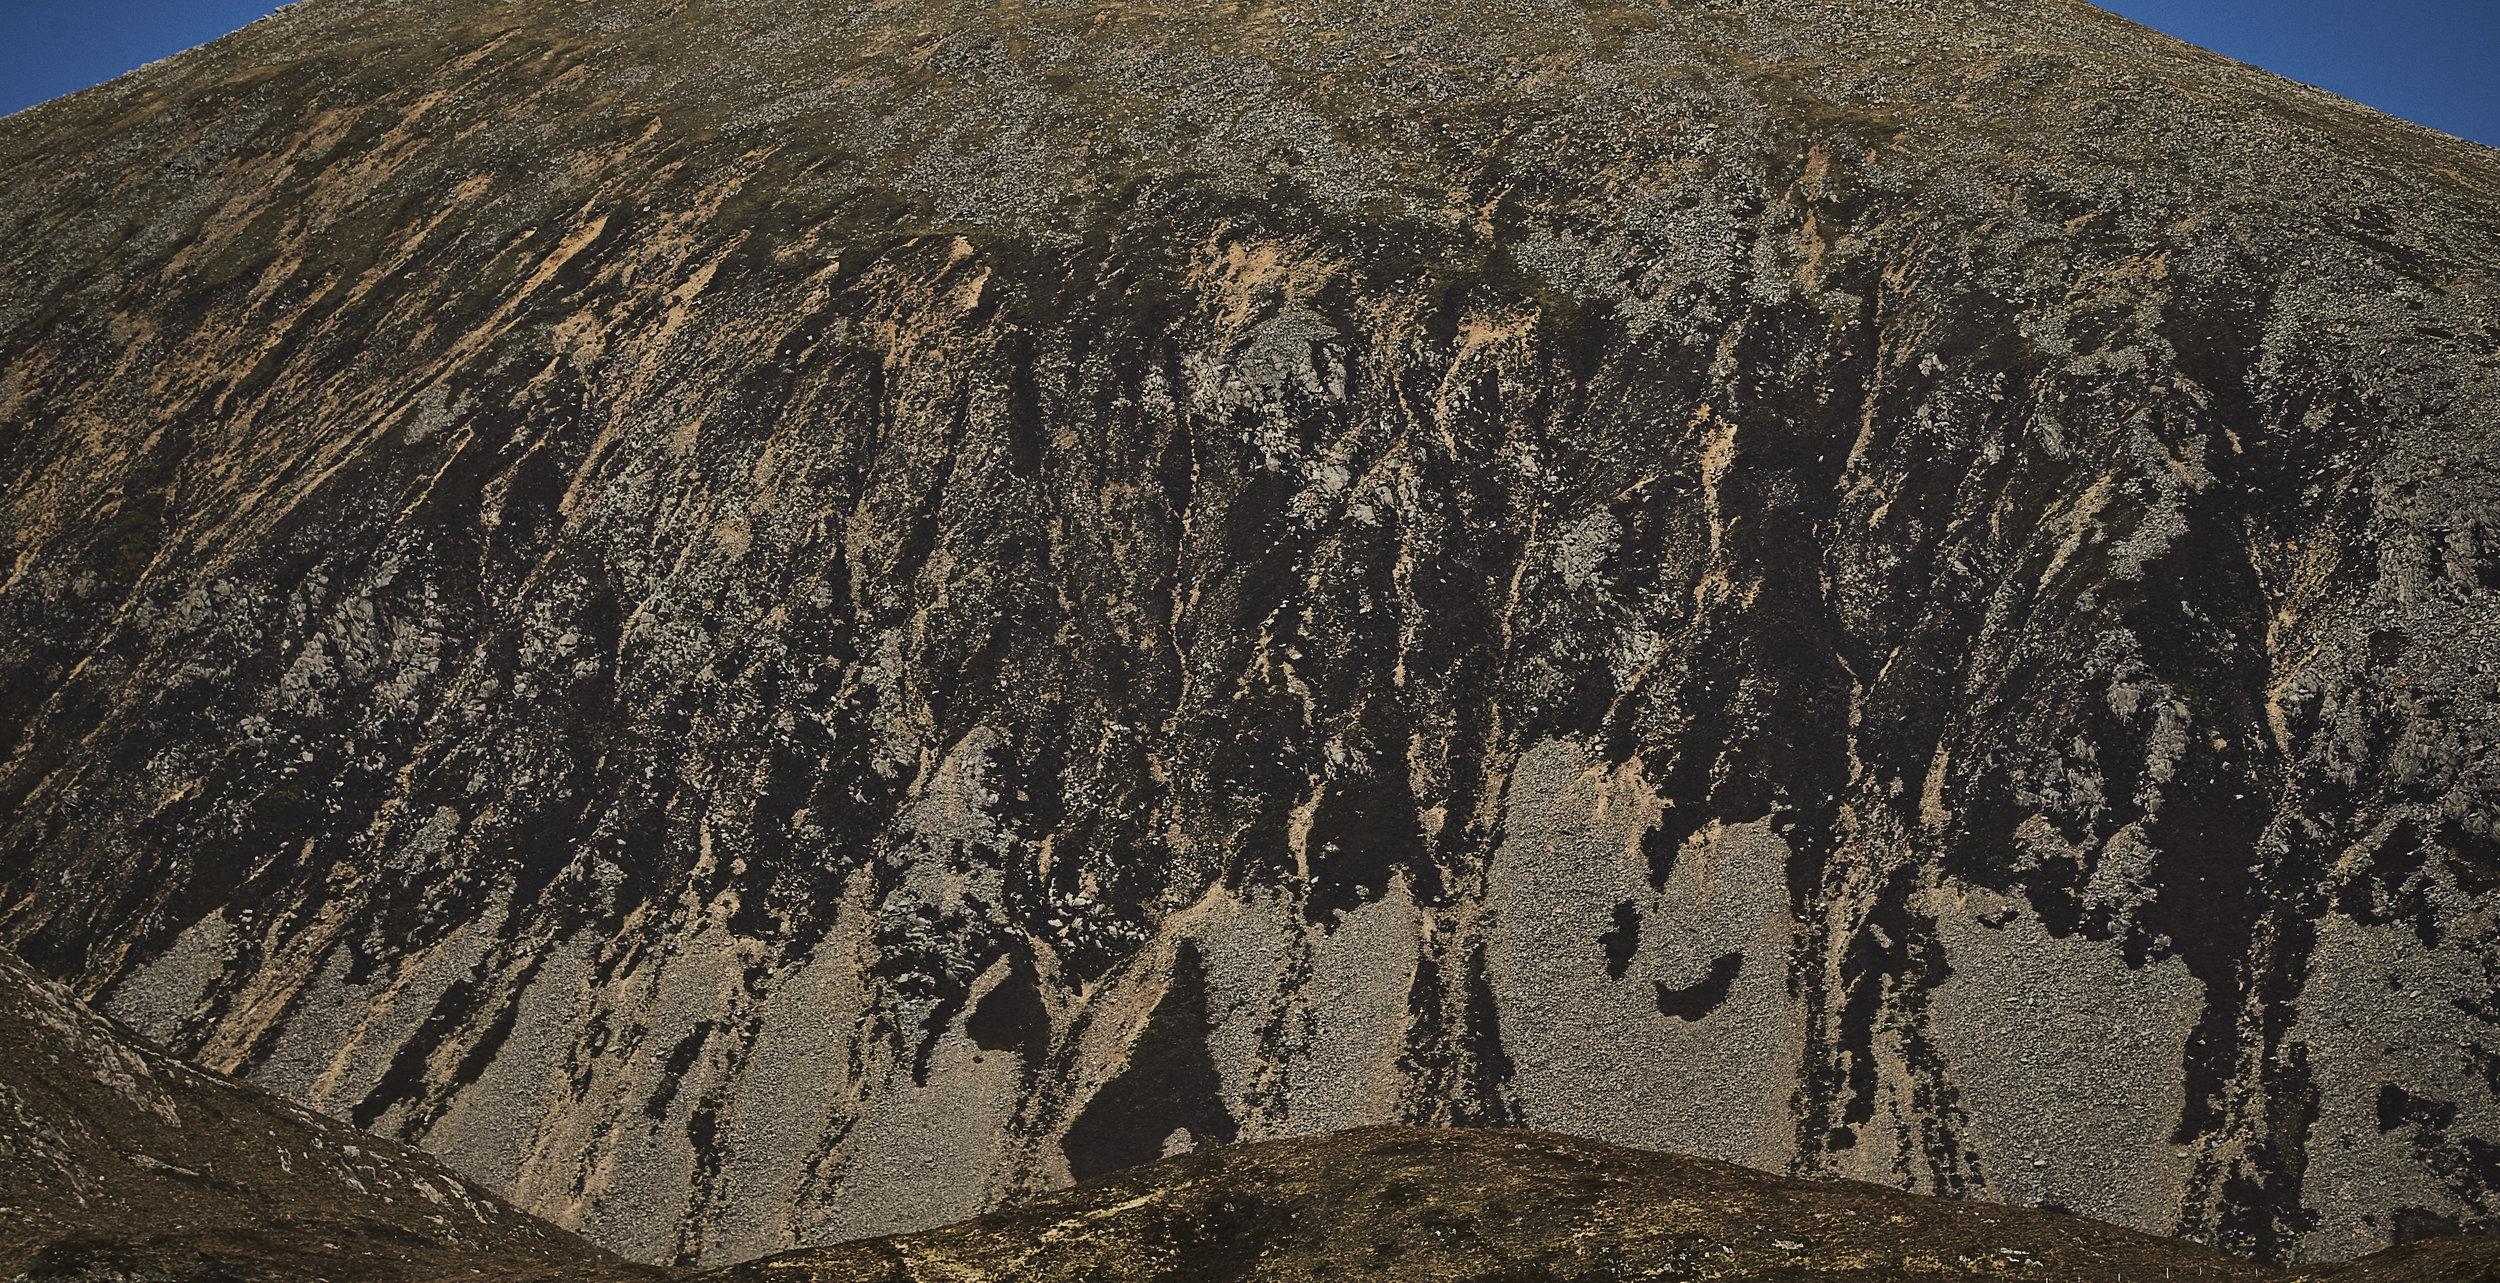 17.04.30_POETRY_SCOTLAND Mountain.jpg